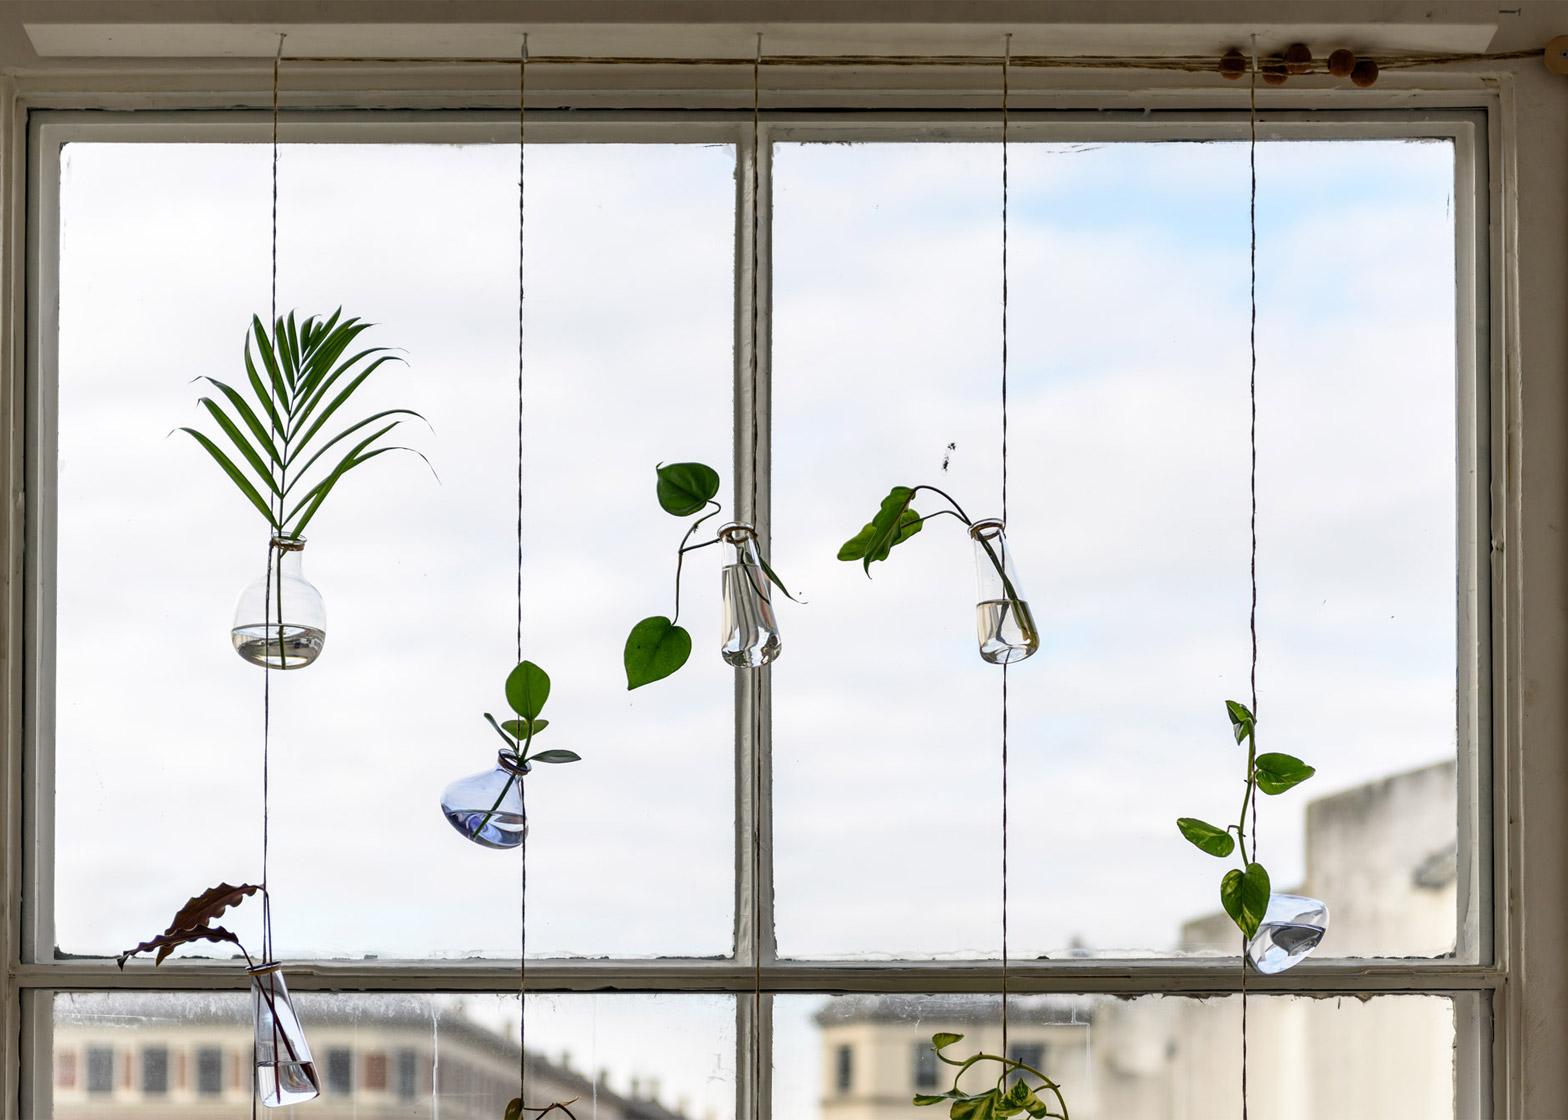 Ikea-Space-10-Innovation-Lab_Alastair-Philip-Wiper_dezeen_1568_14